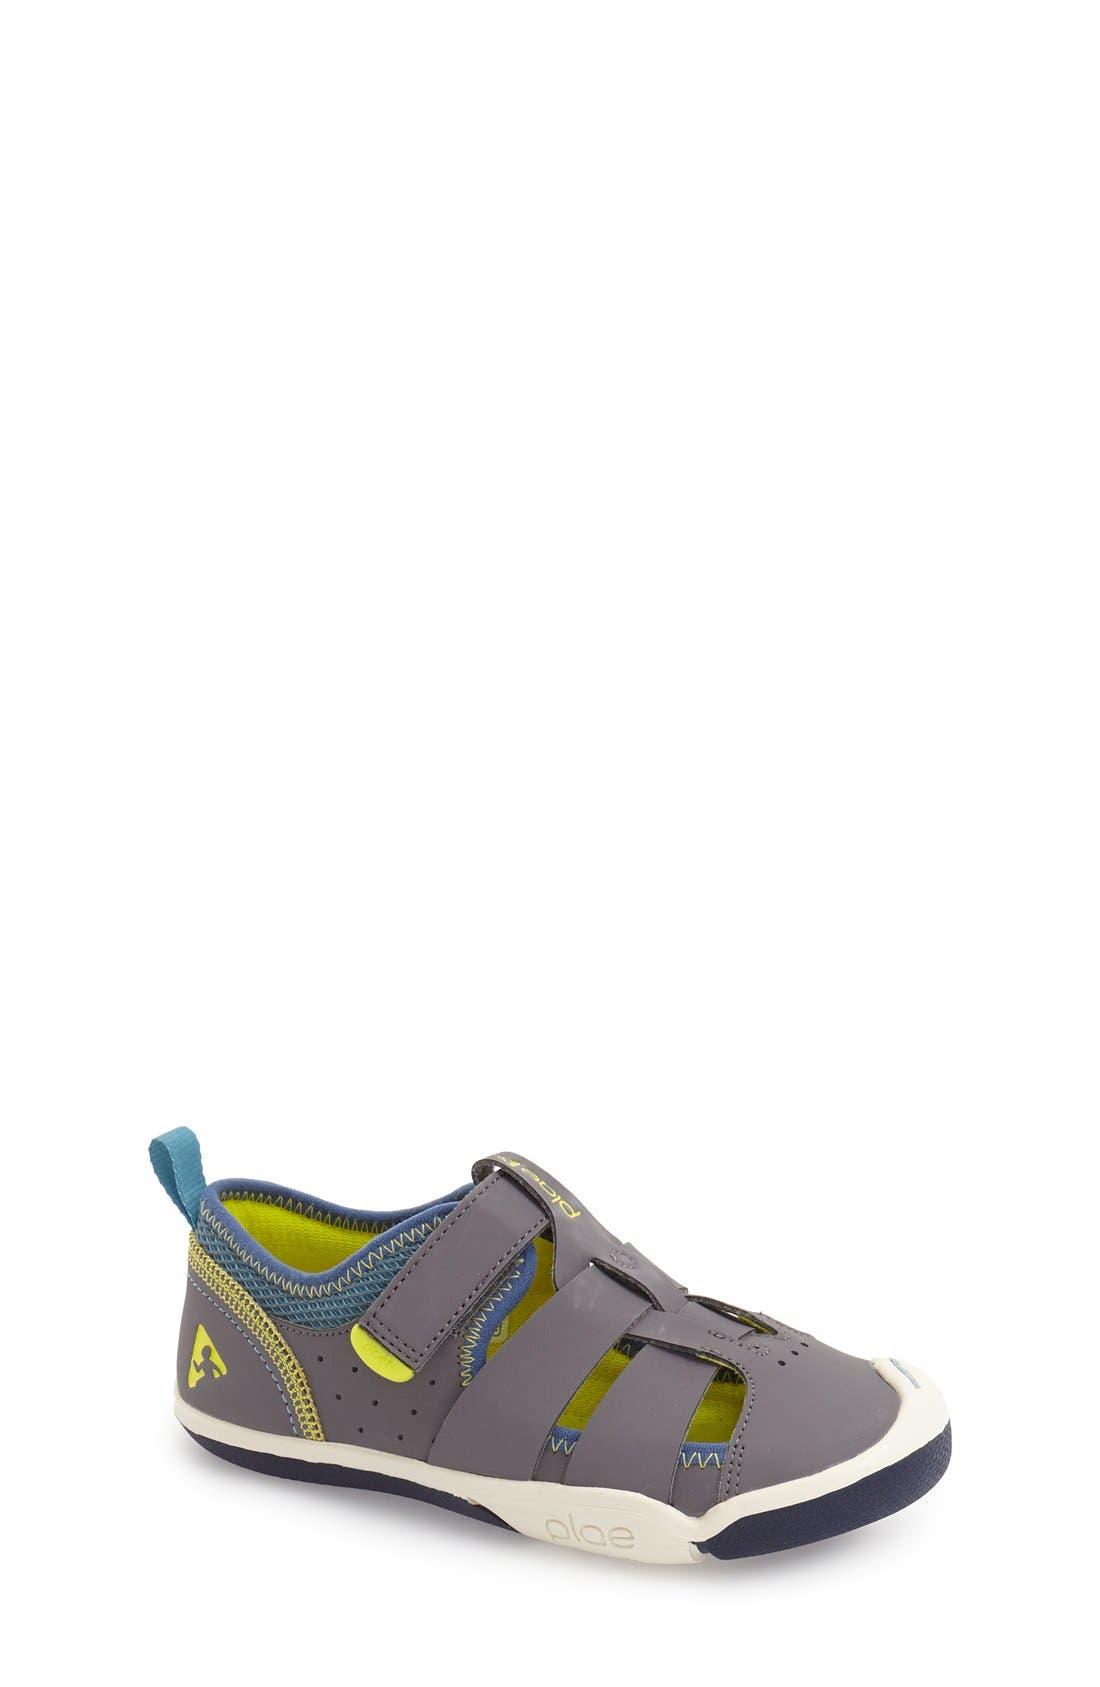 Sam Customizable Sneaker,                             Main thumbnail 1, color,                             STEEL